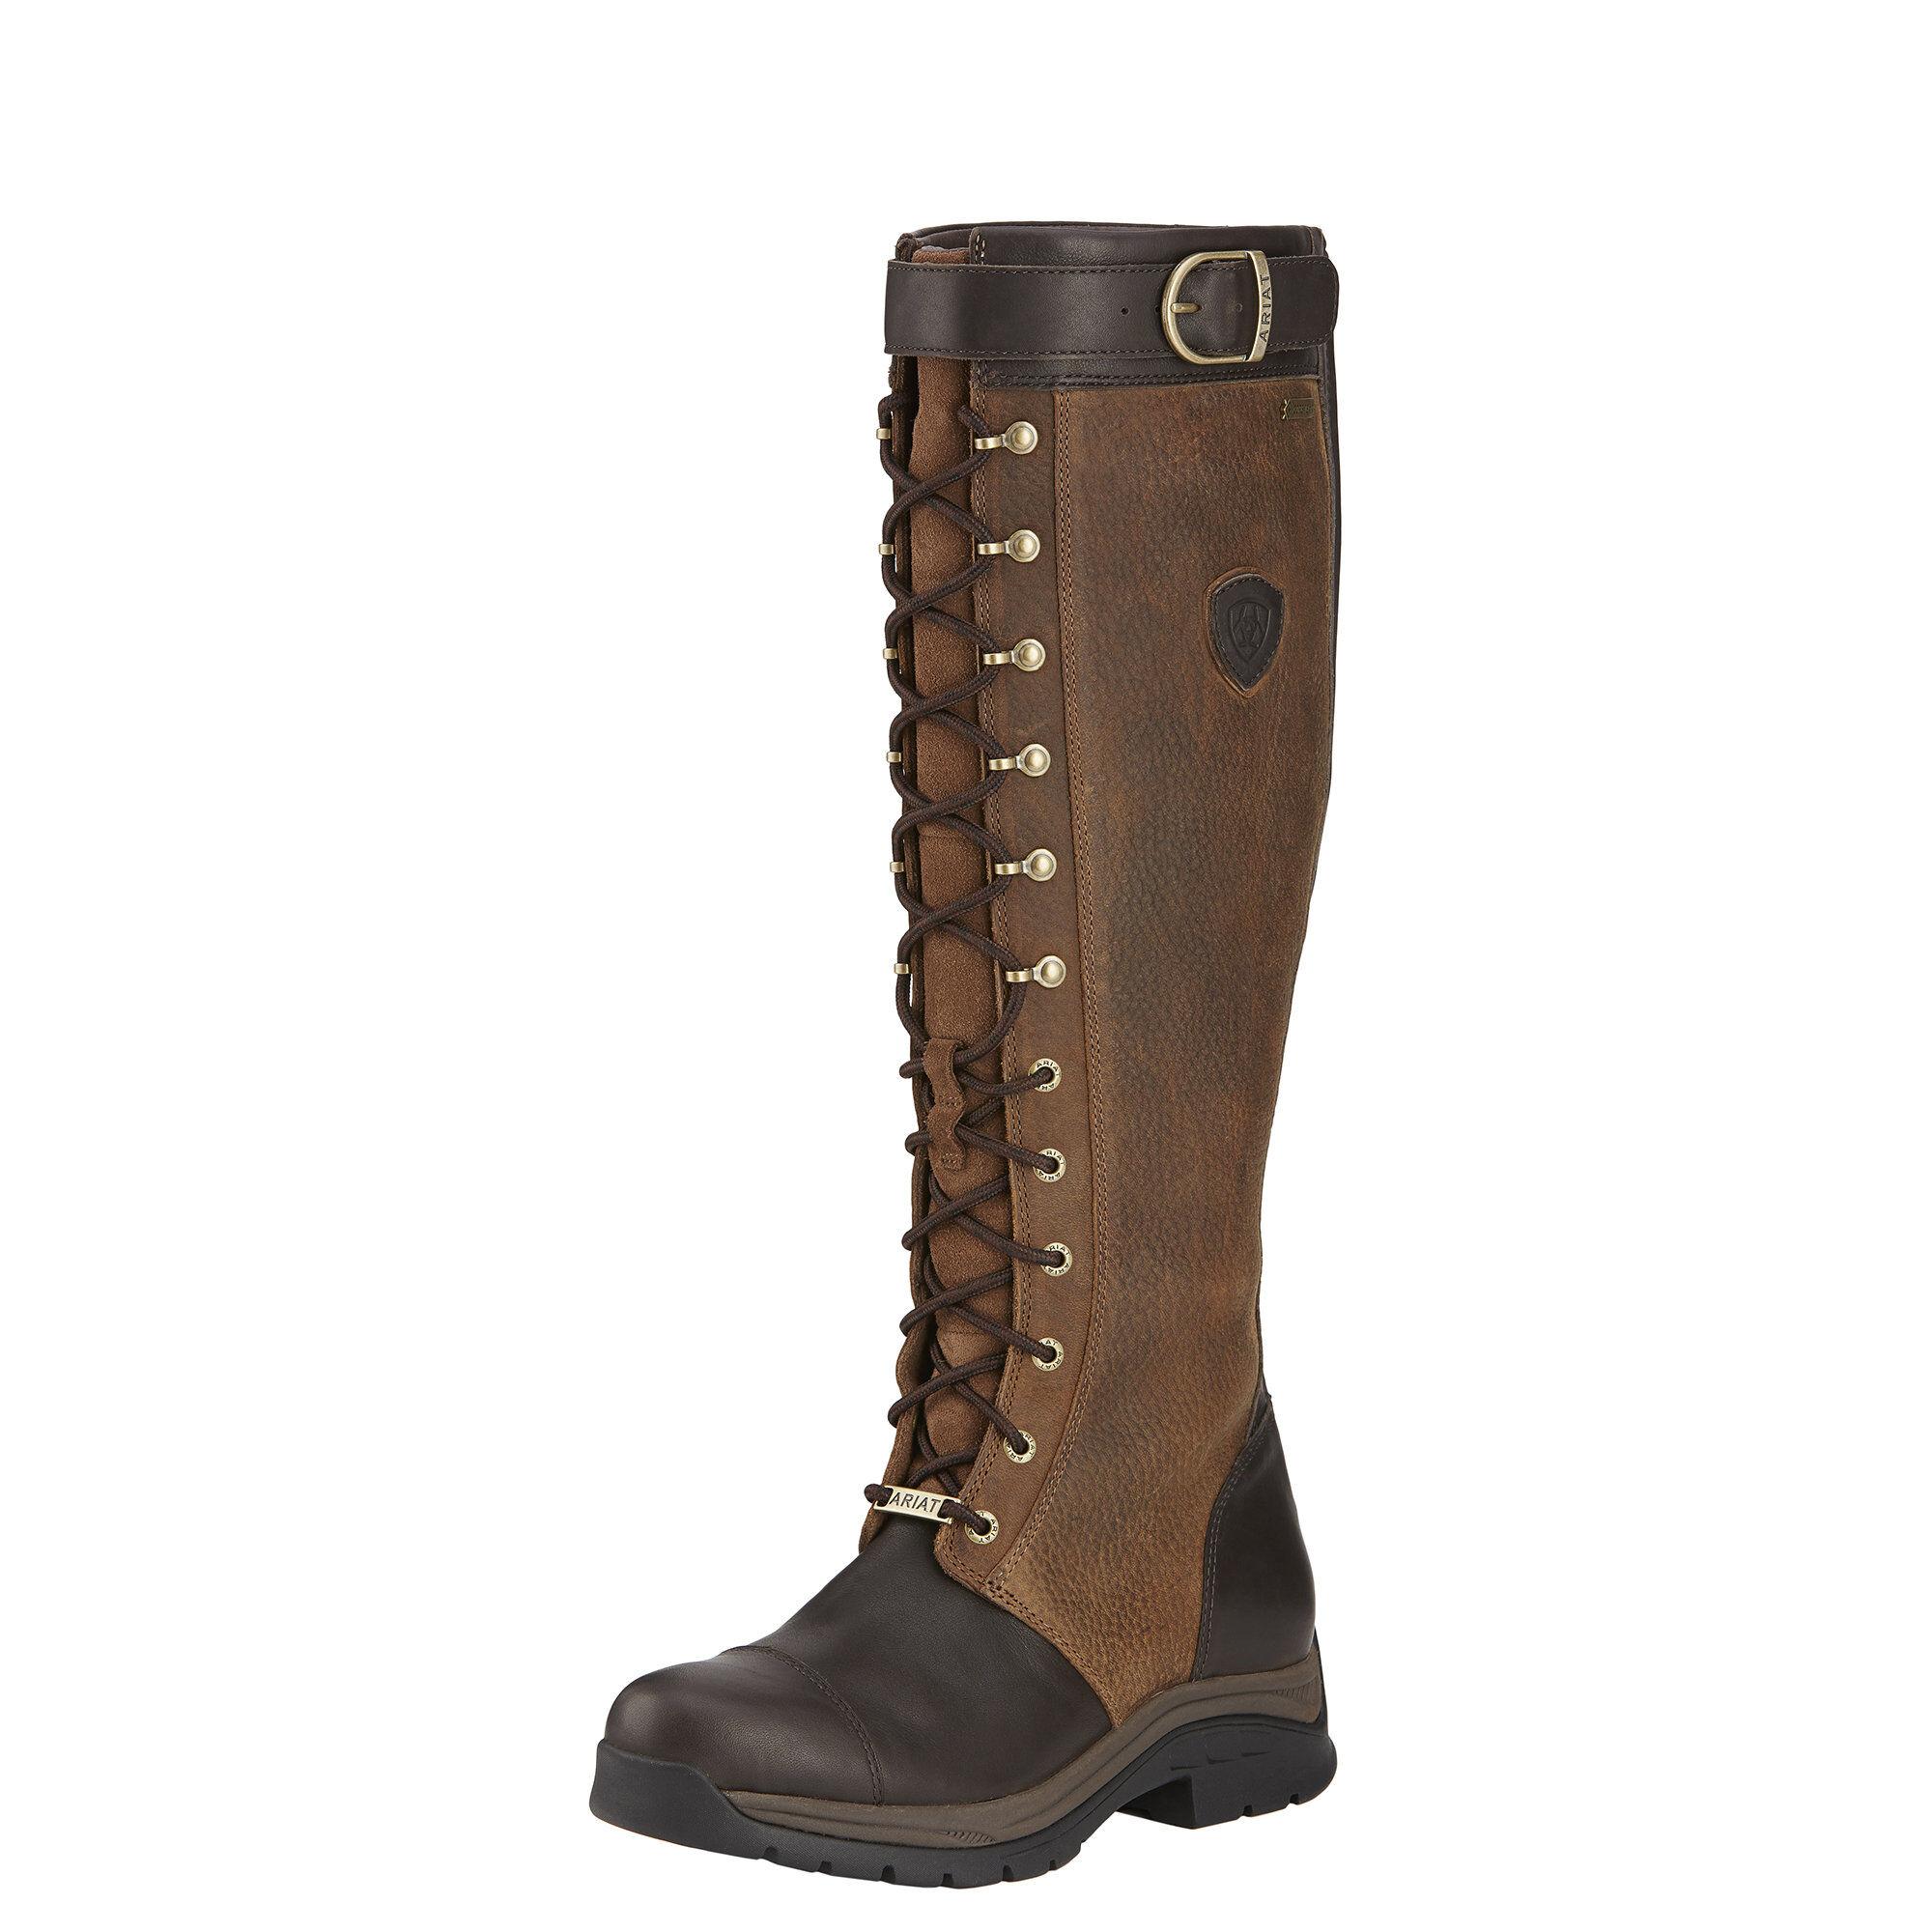 Ariat Berwick GORE-TEX Insulated Riding Boot (Women's) F369D1uHg